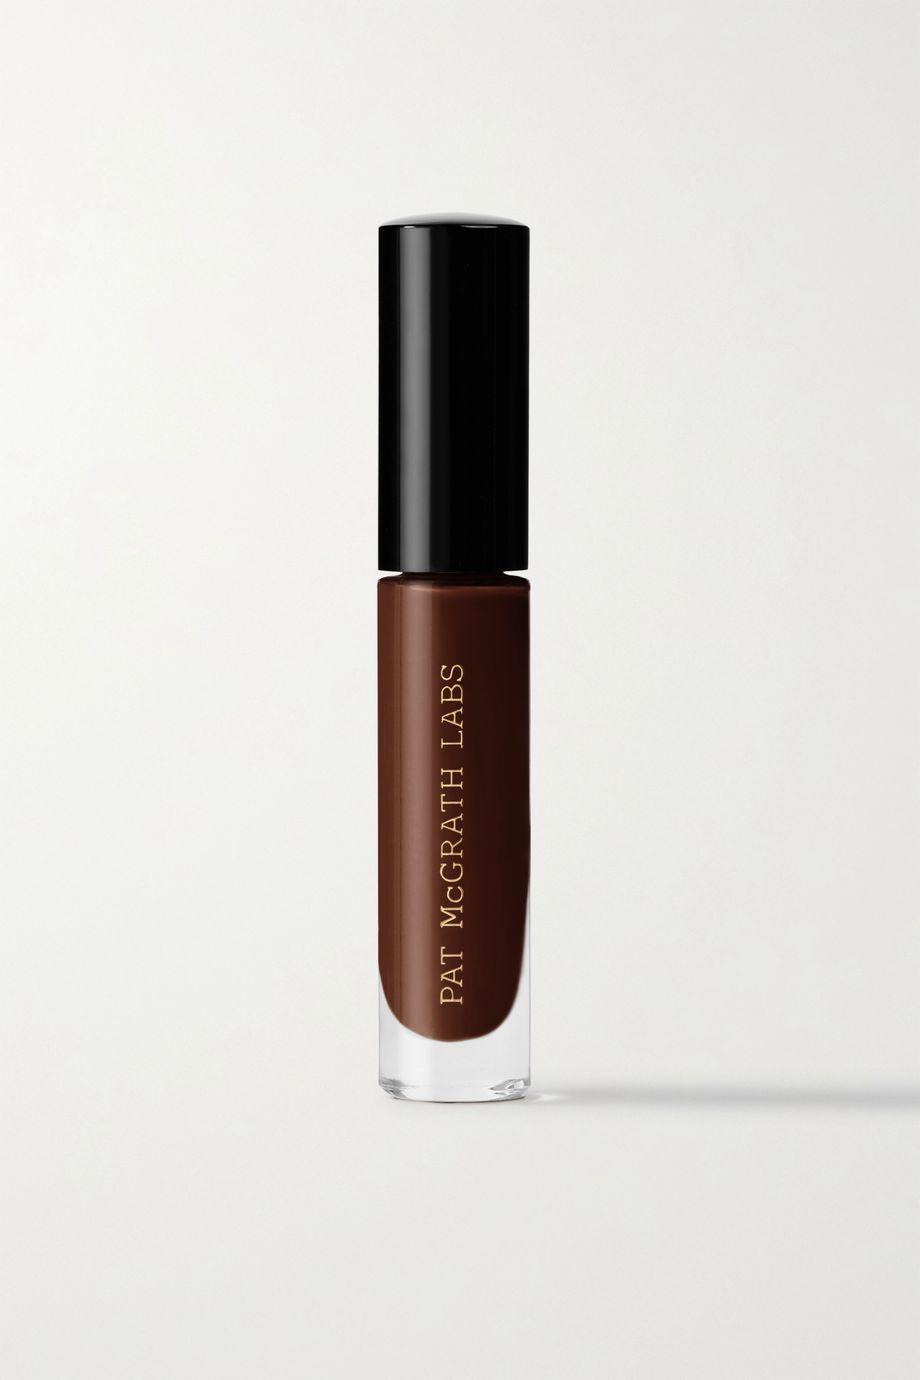 Pat McGrath Labs Skin Fetish: Sublime Perfection Concealer - D36, 5ml